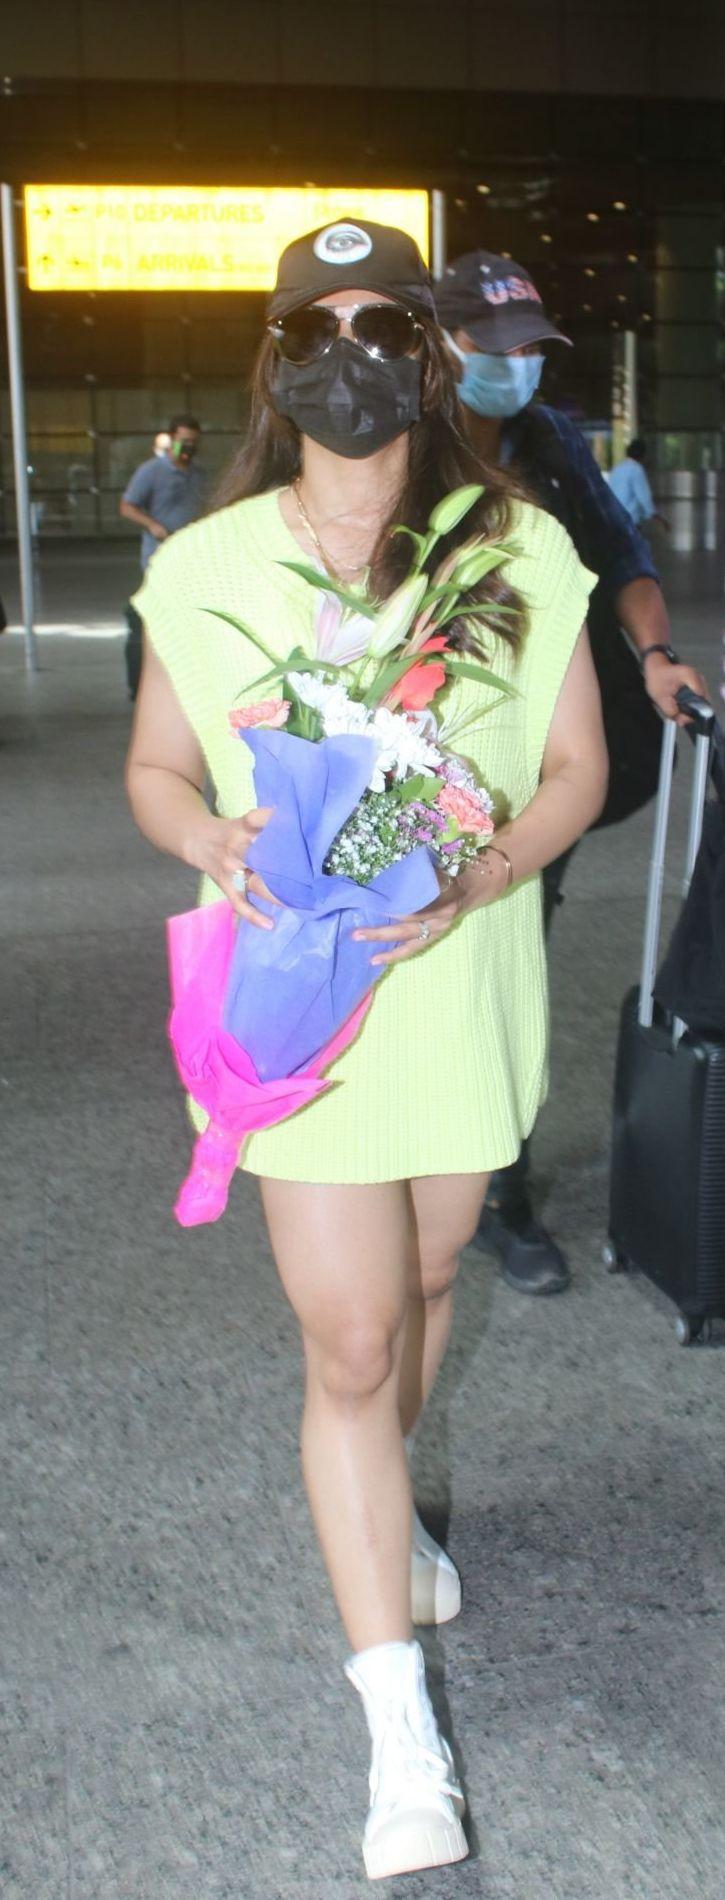 Rashmika Mandanna in a light yellow sweater dress at the airport-1